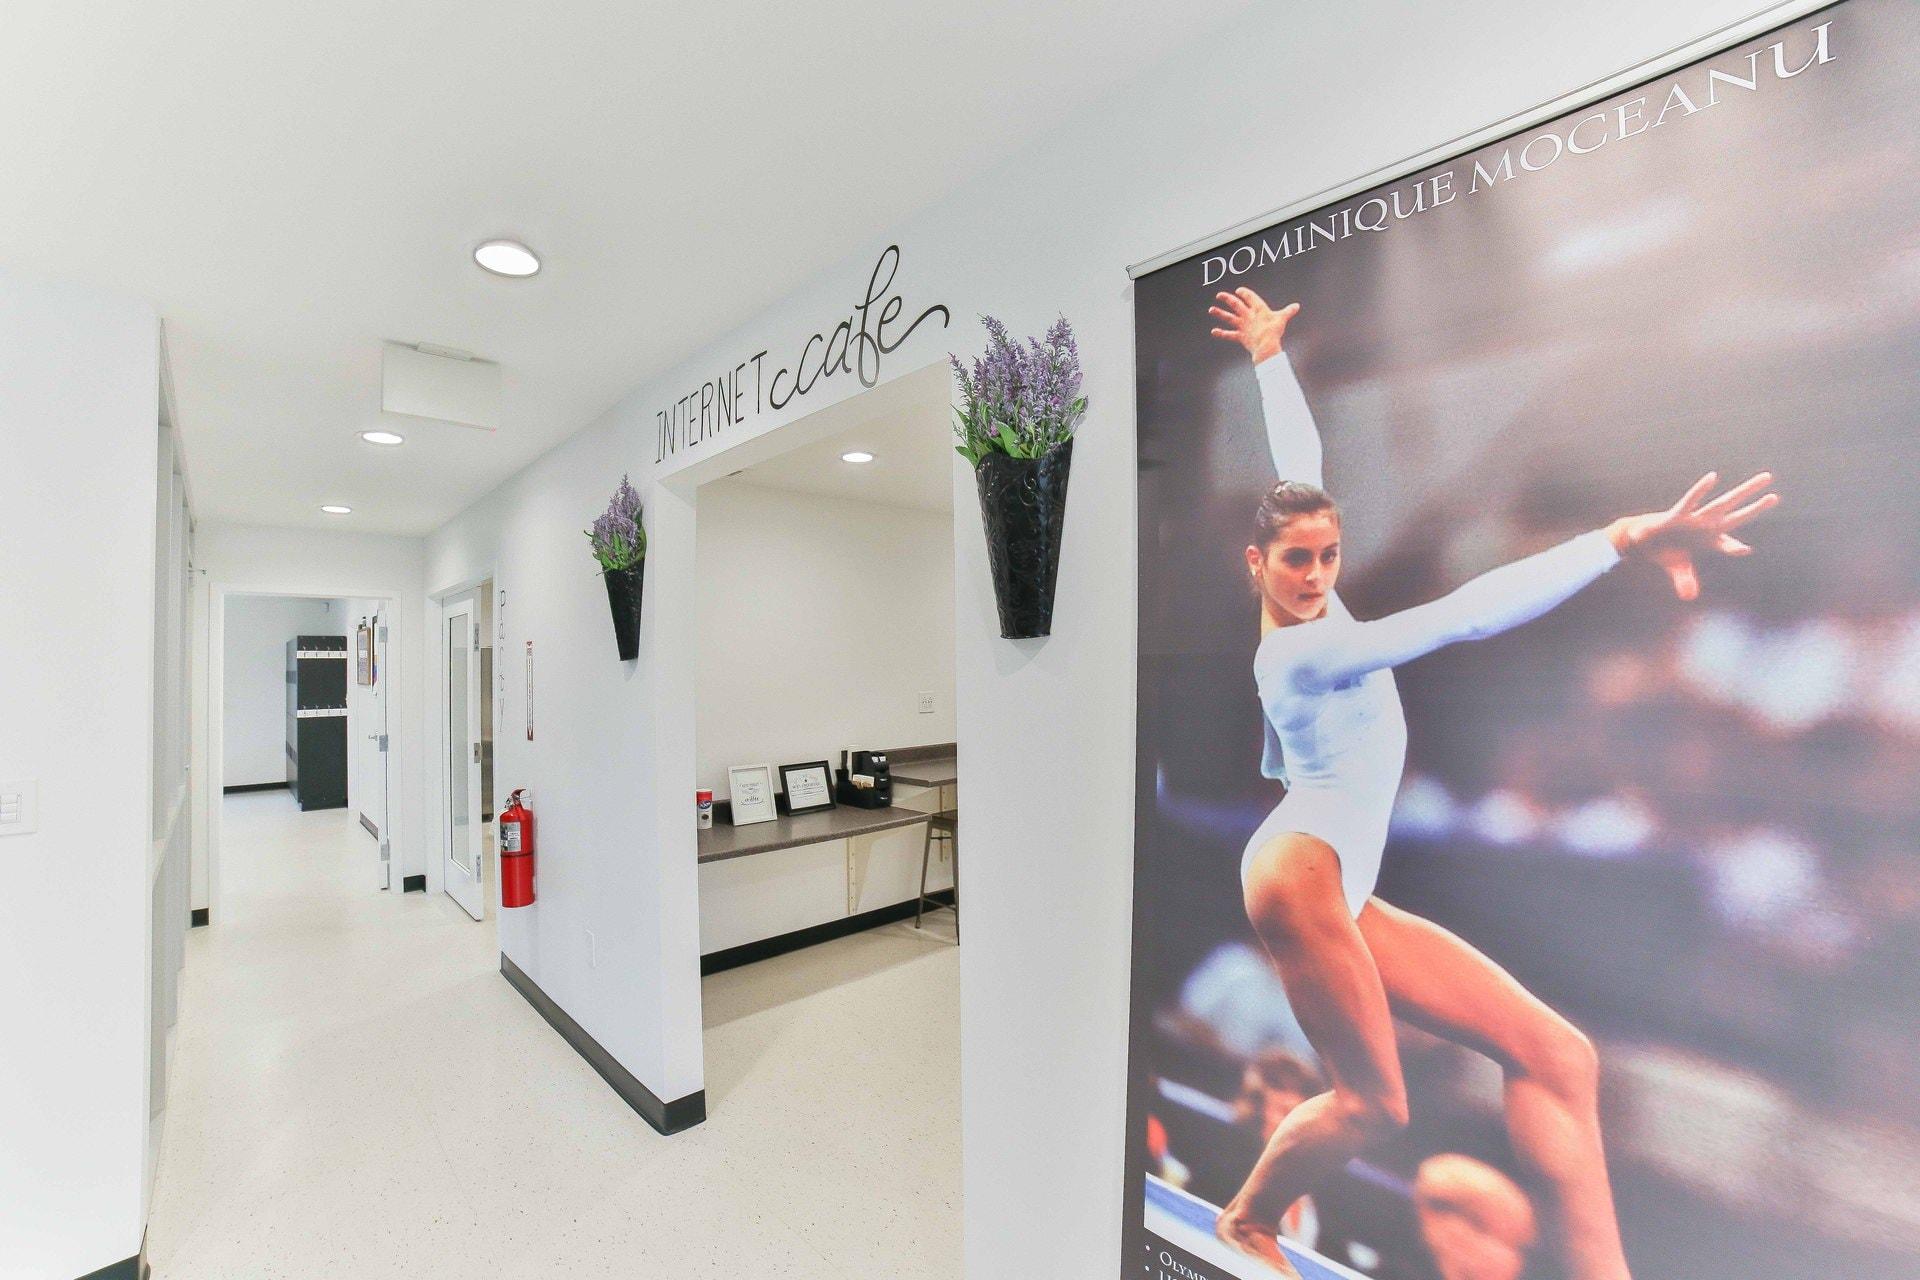 Dominique Moceanu's Gymnastics Center